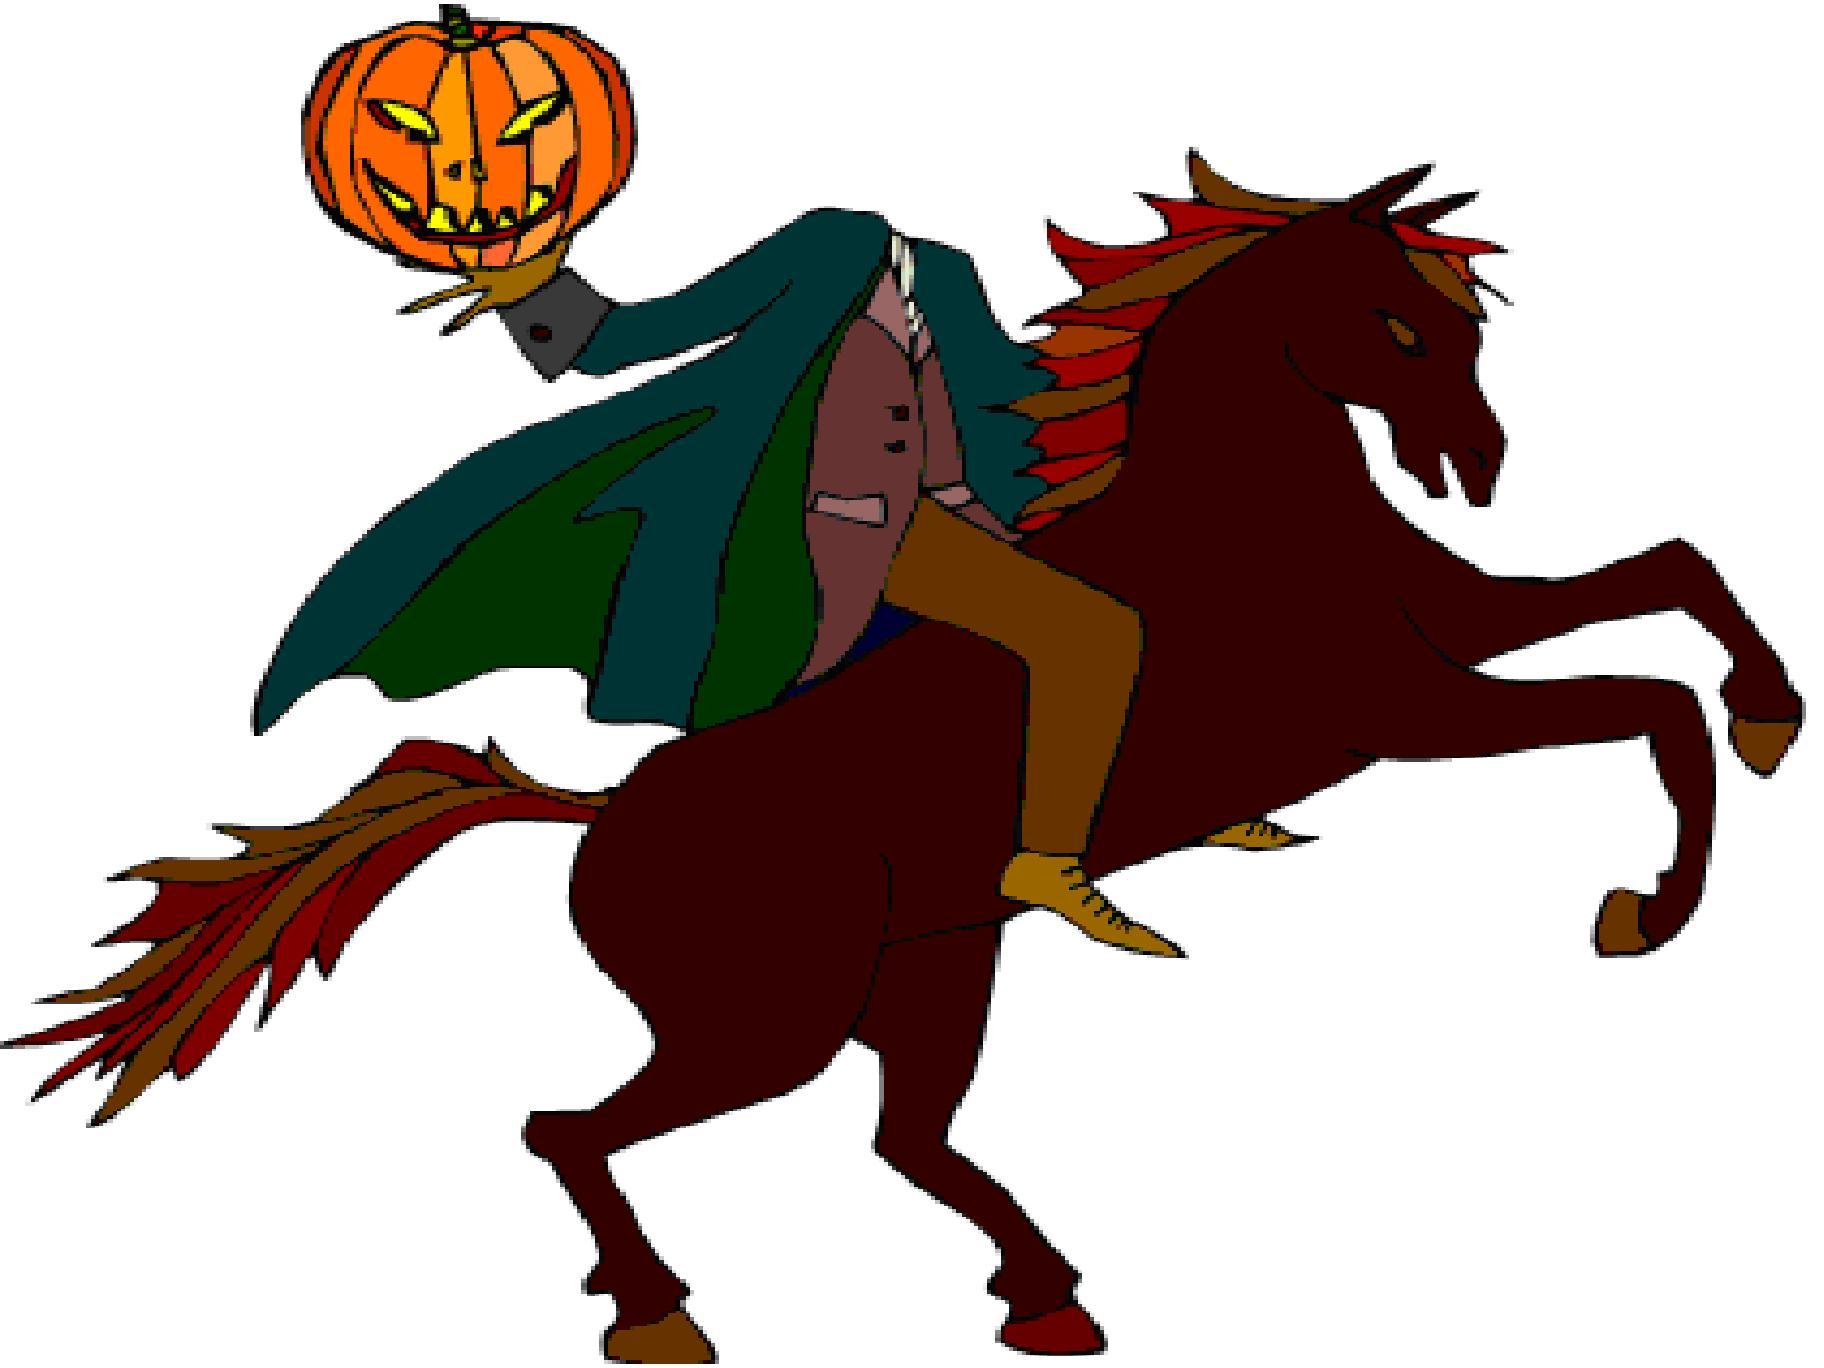 Filename: logo-headless-horseman3.jpg - Headless Horseman PNG